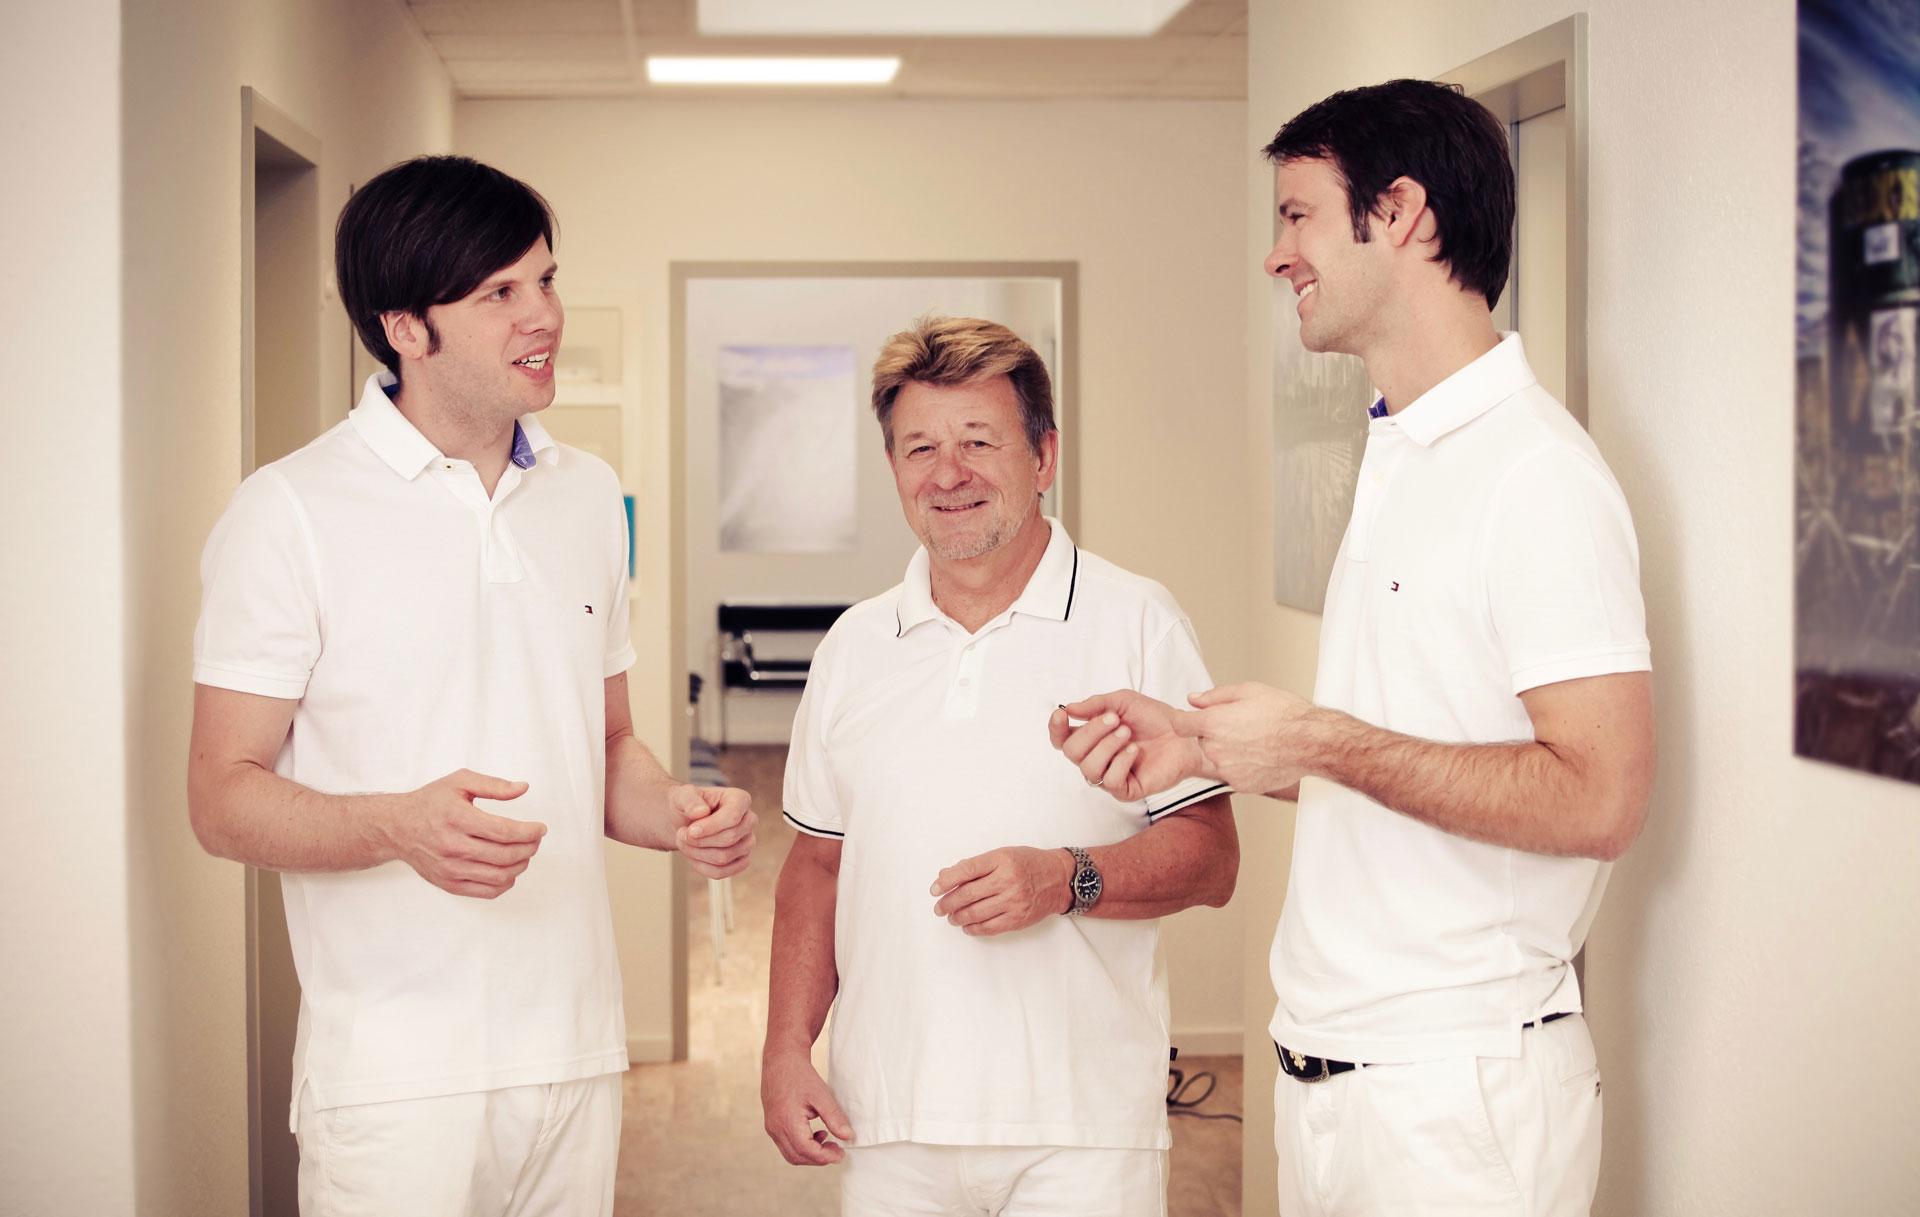 Internist, Hausarzt, Allgemeinmedizin, Sportmedizin, Ernährungsmedizin, Kardiologie, Angiologie